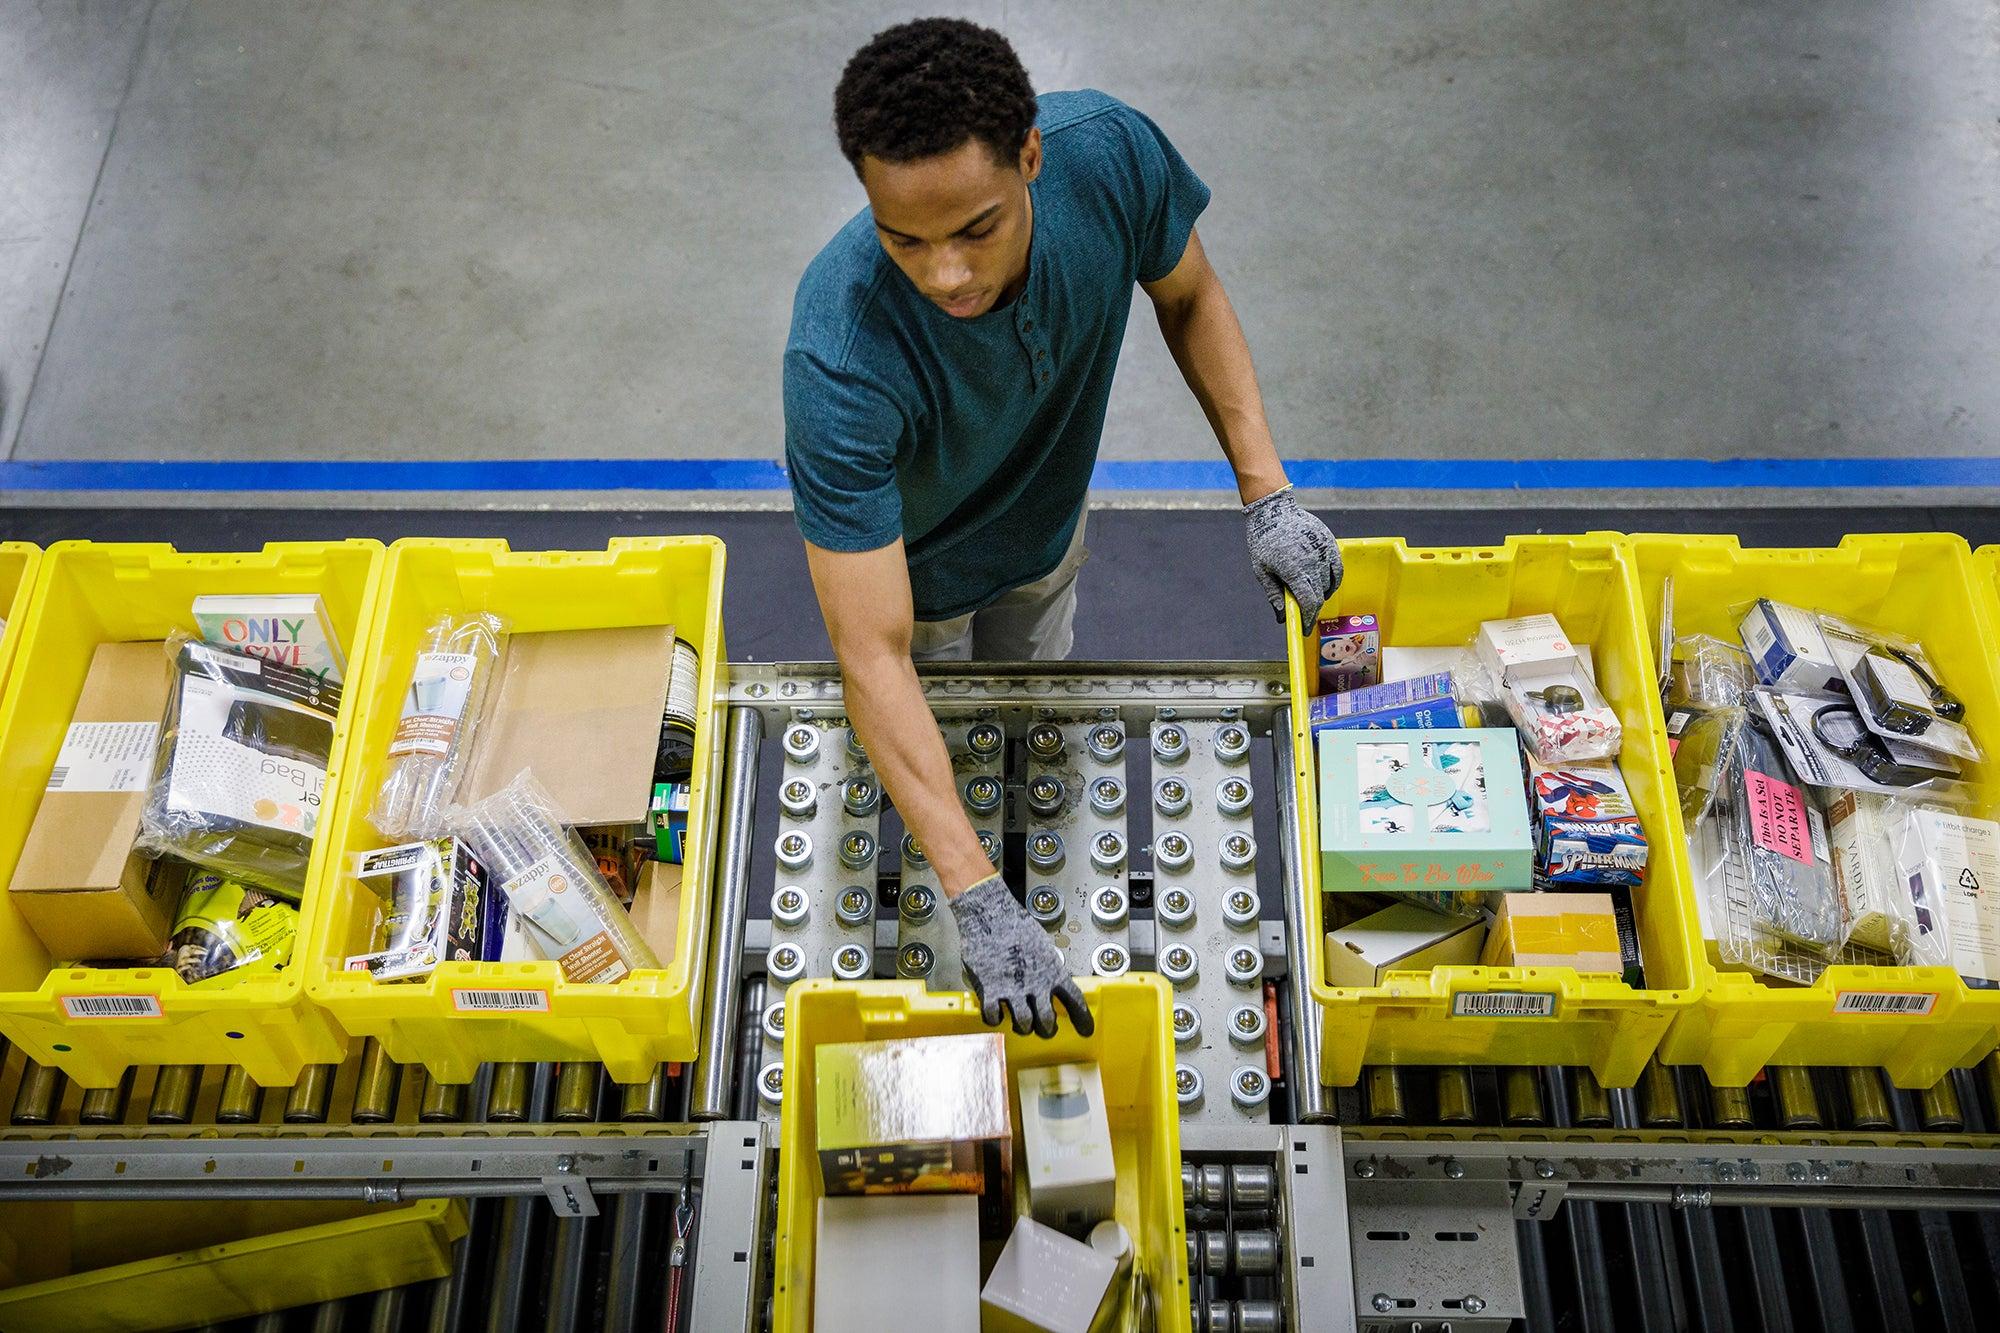 Big tech receive mixed reviews during COVID19 crisis